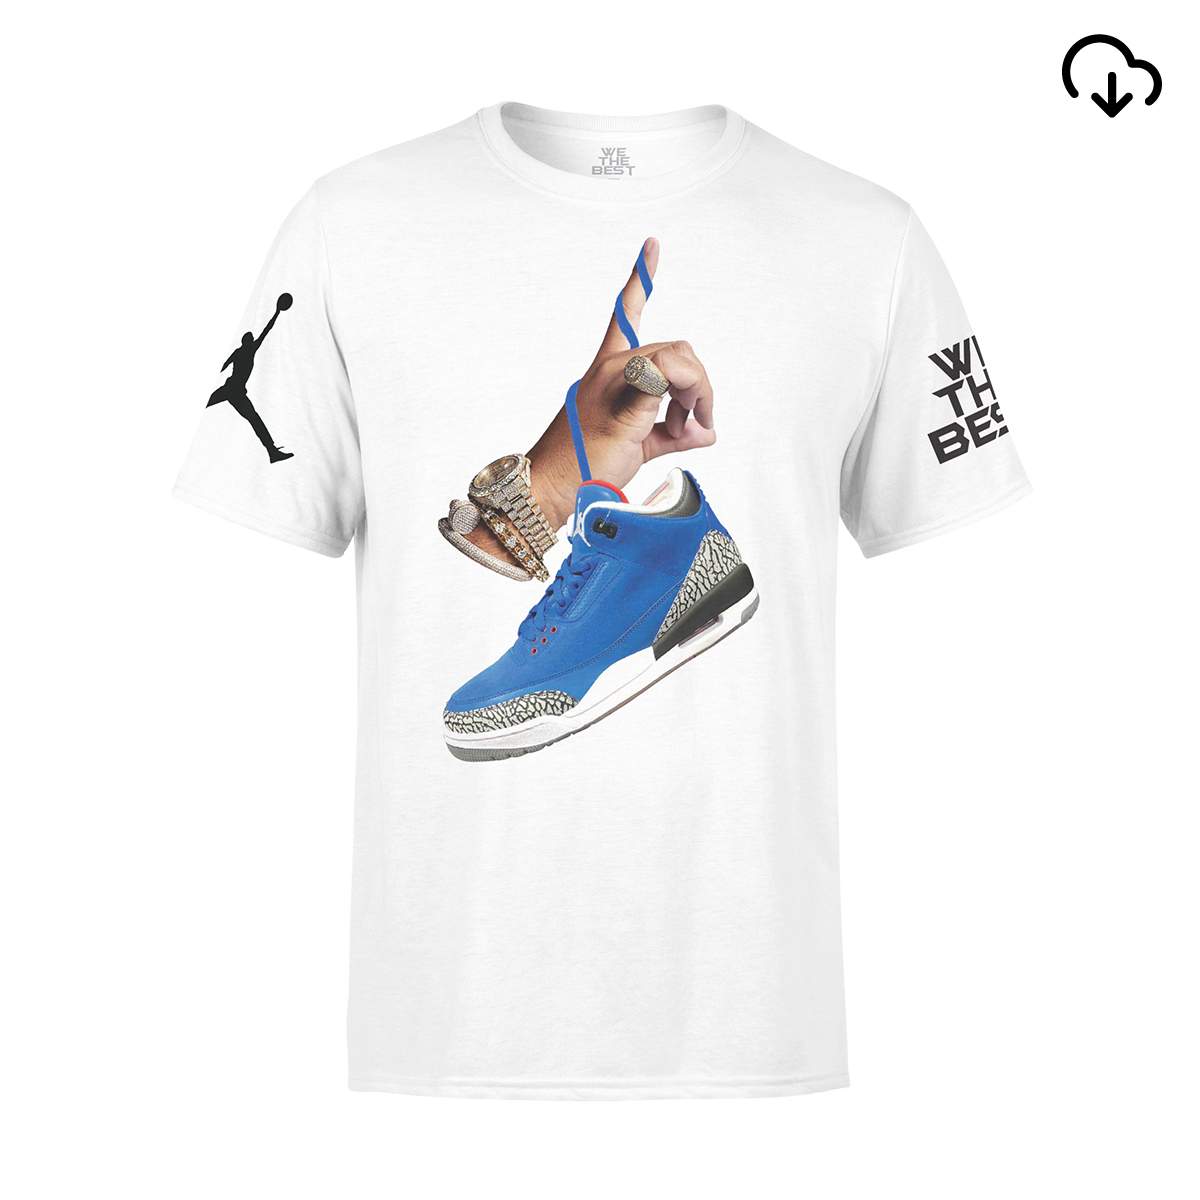 DJ Khaled x Jordan Suede Sneakers T-shirt - White